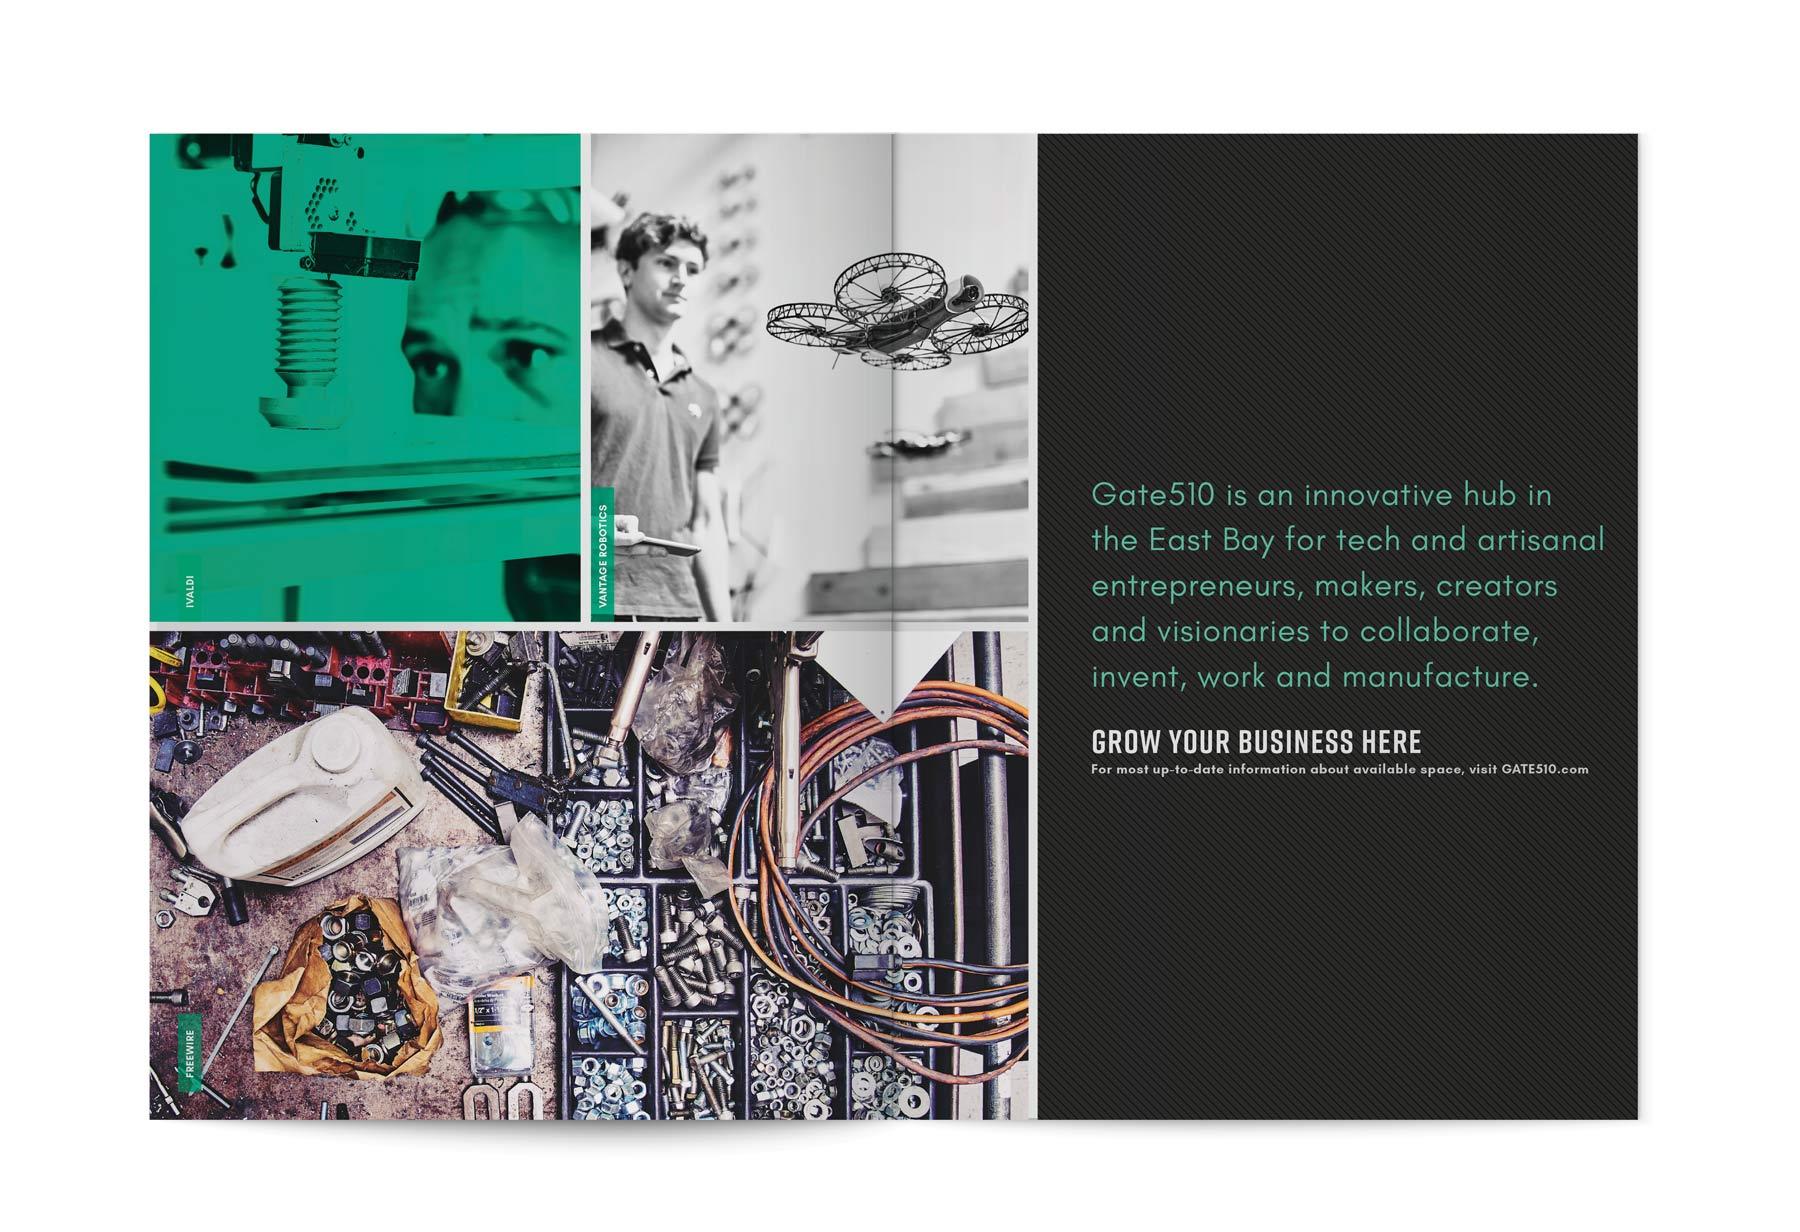 Gate510-Brochure-spread-1.jpg